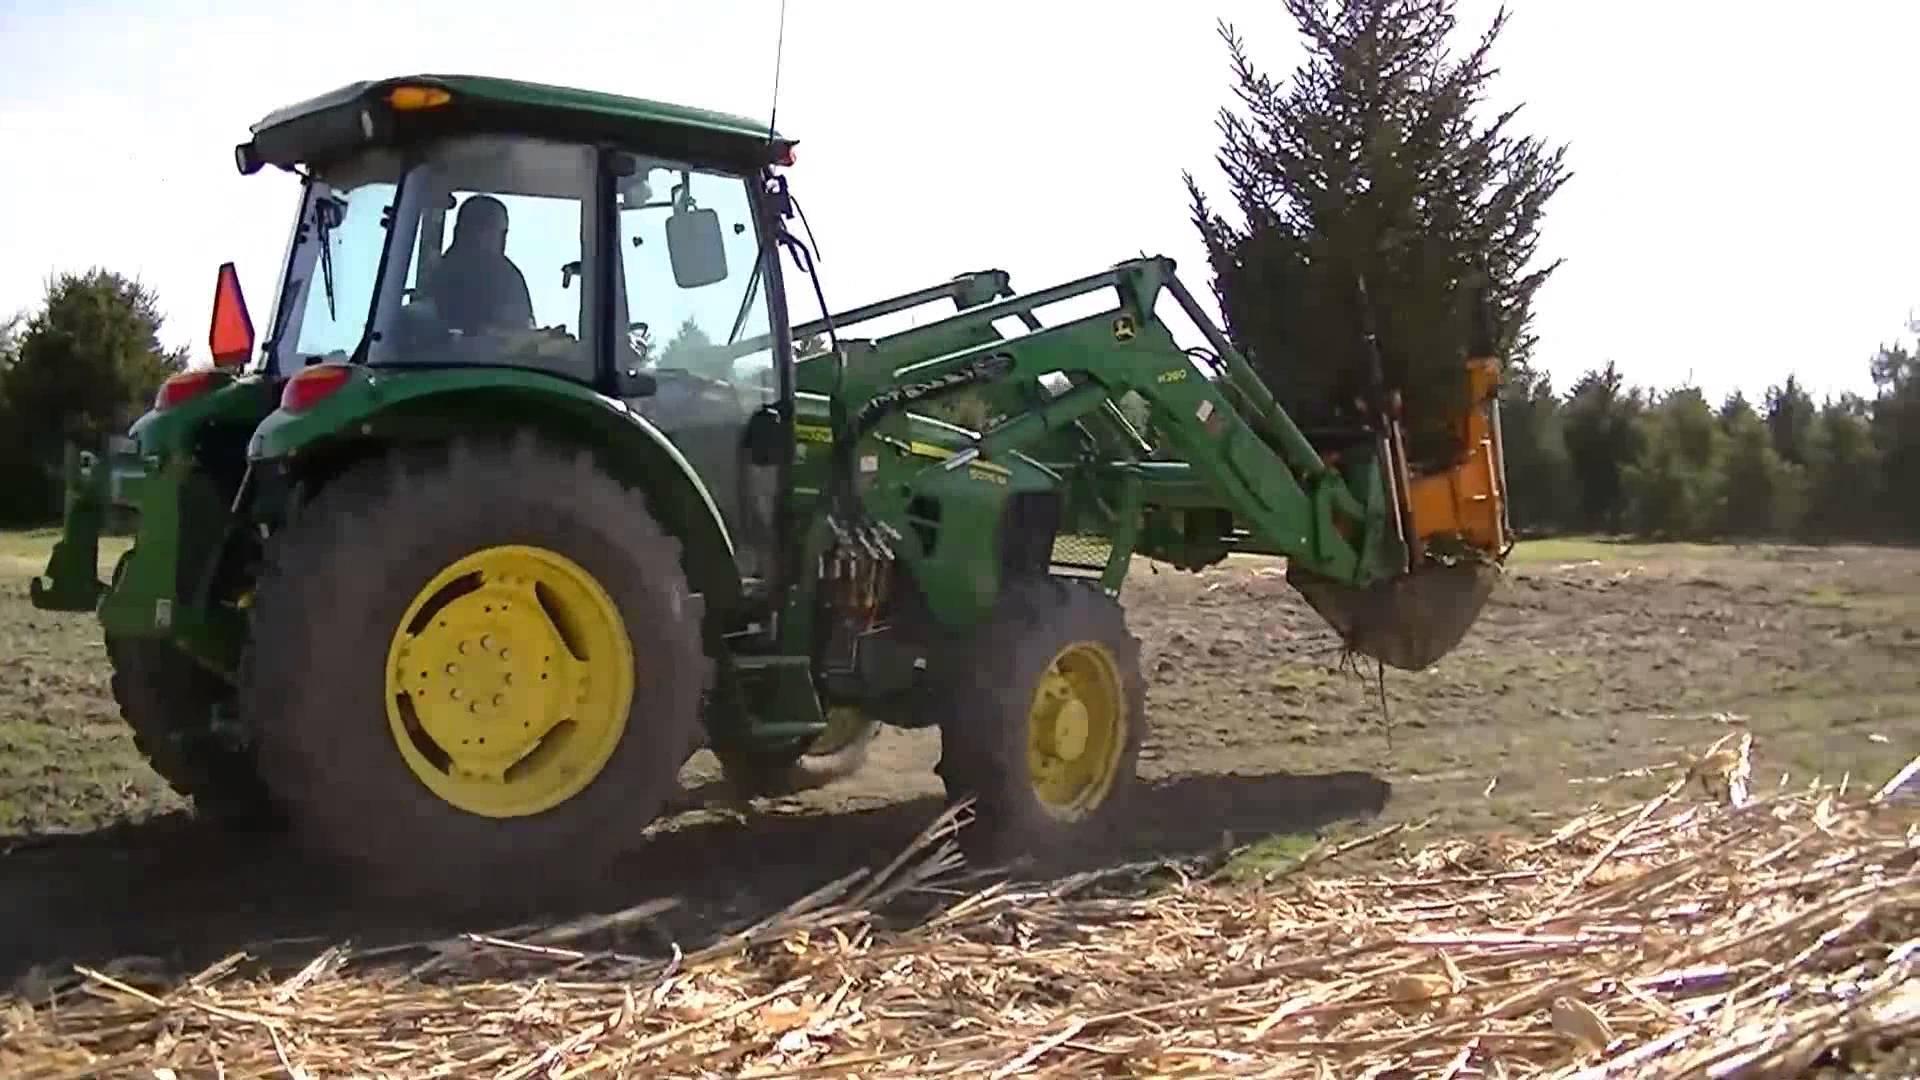 John Deere Front Loader Tree Spade Digging a big tree and re ...